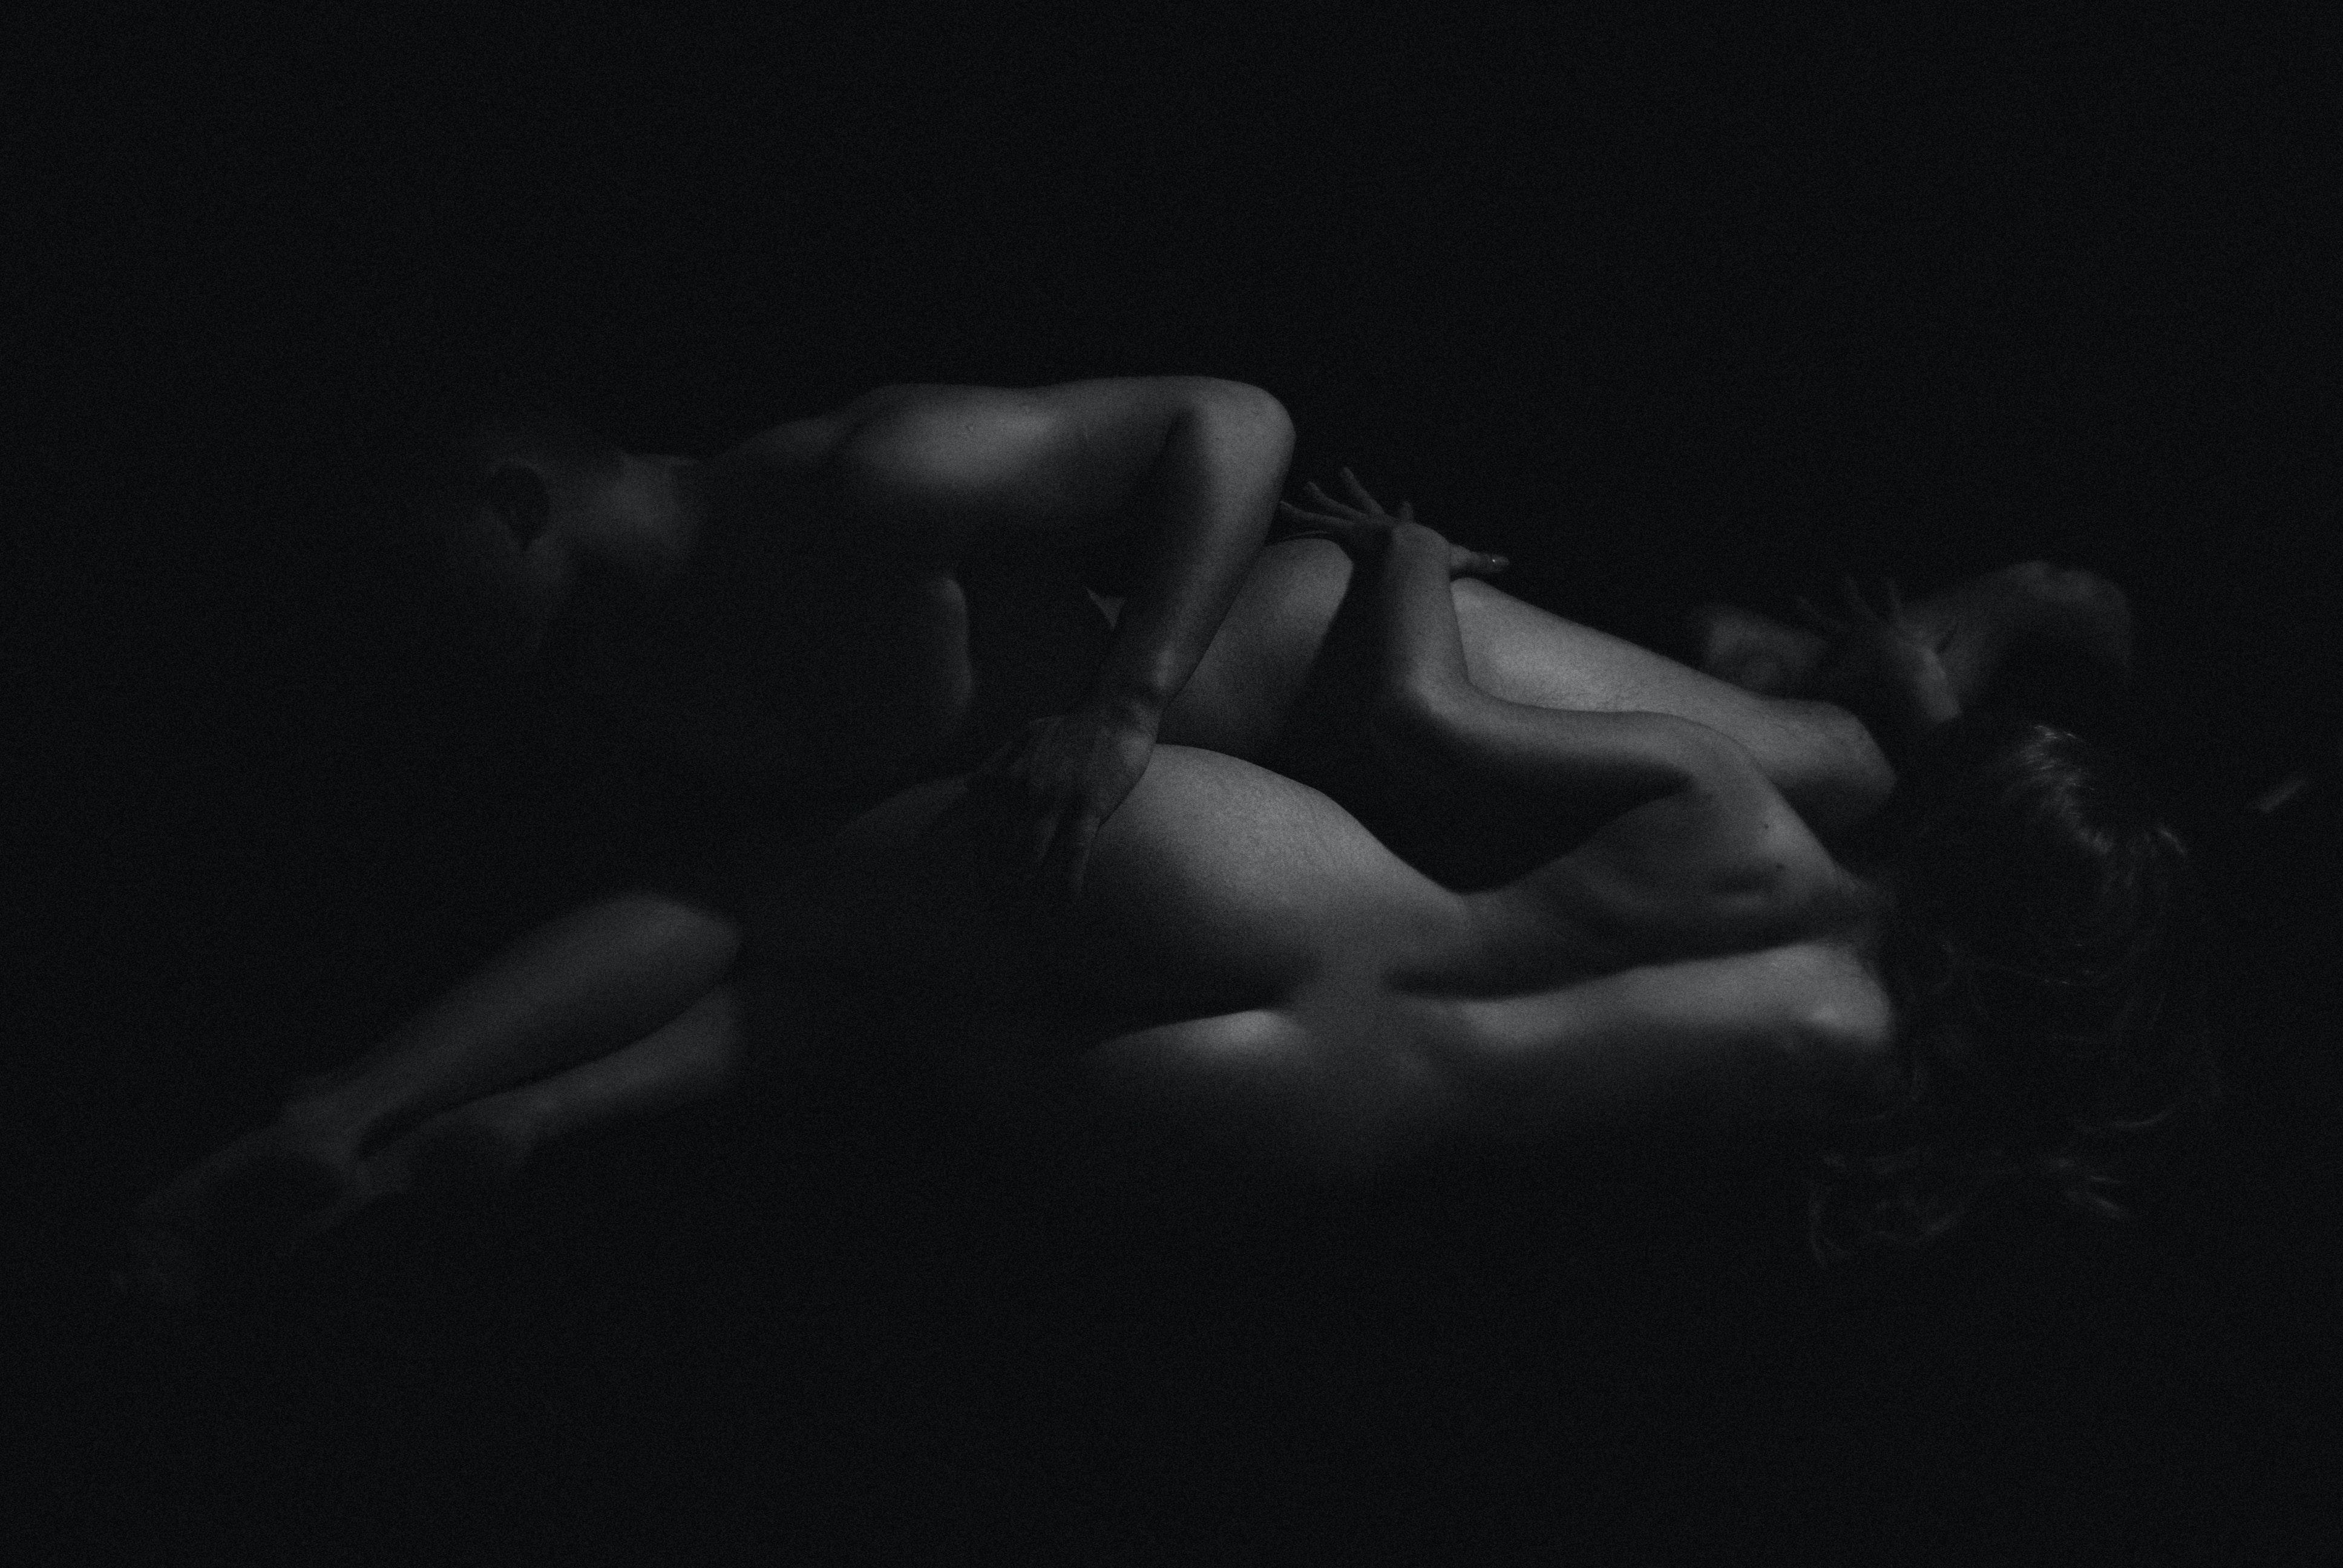 Black and white erotic wallpaper